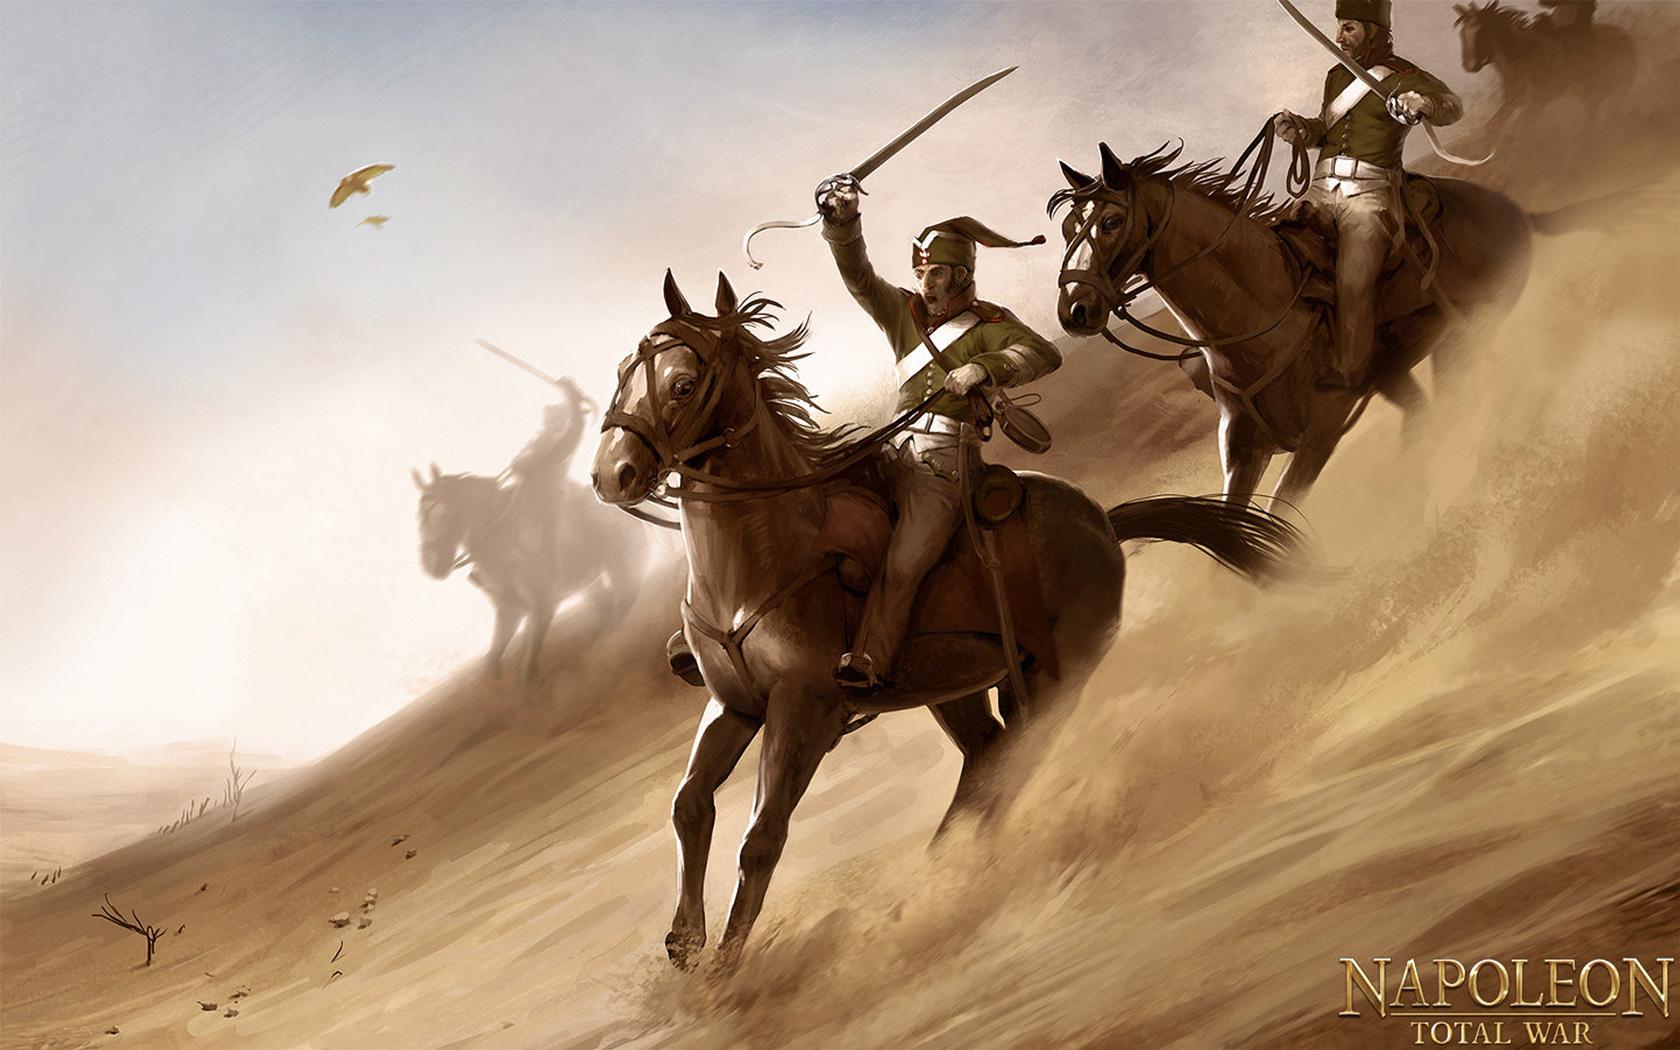 Free Napoleon: Total War Wallpaper in 1680x1050